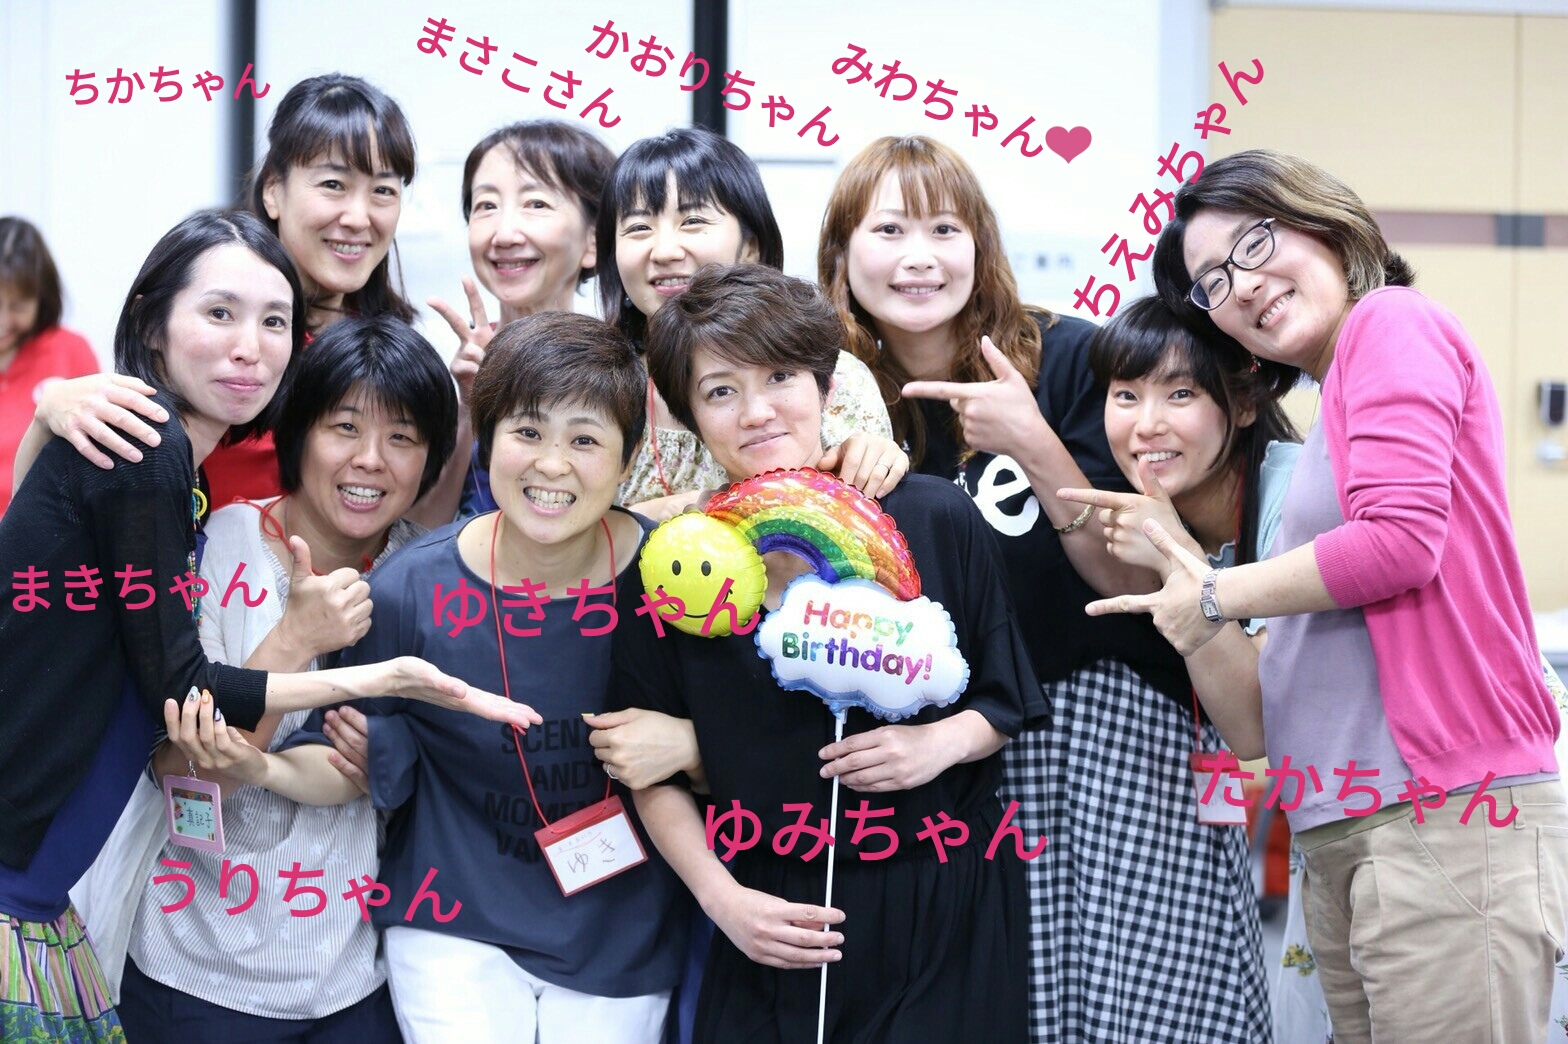 2018/6/26/1010HAPPY藤沢クラス Dグループ ①魂に響いた言葉 ②感想